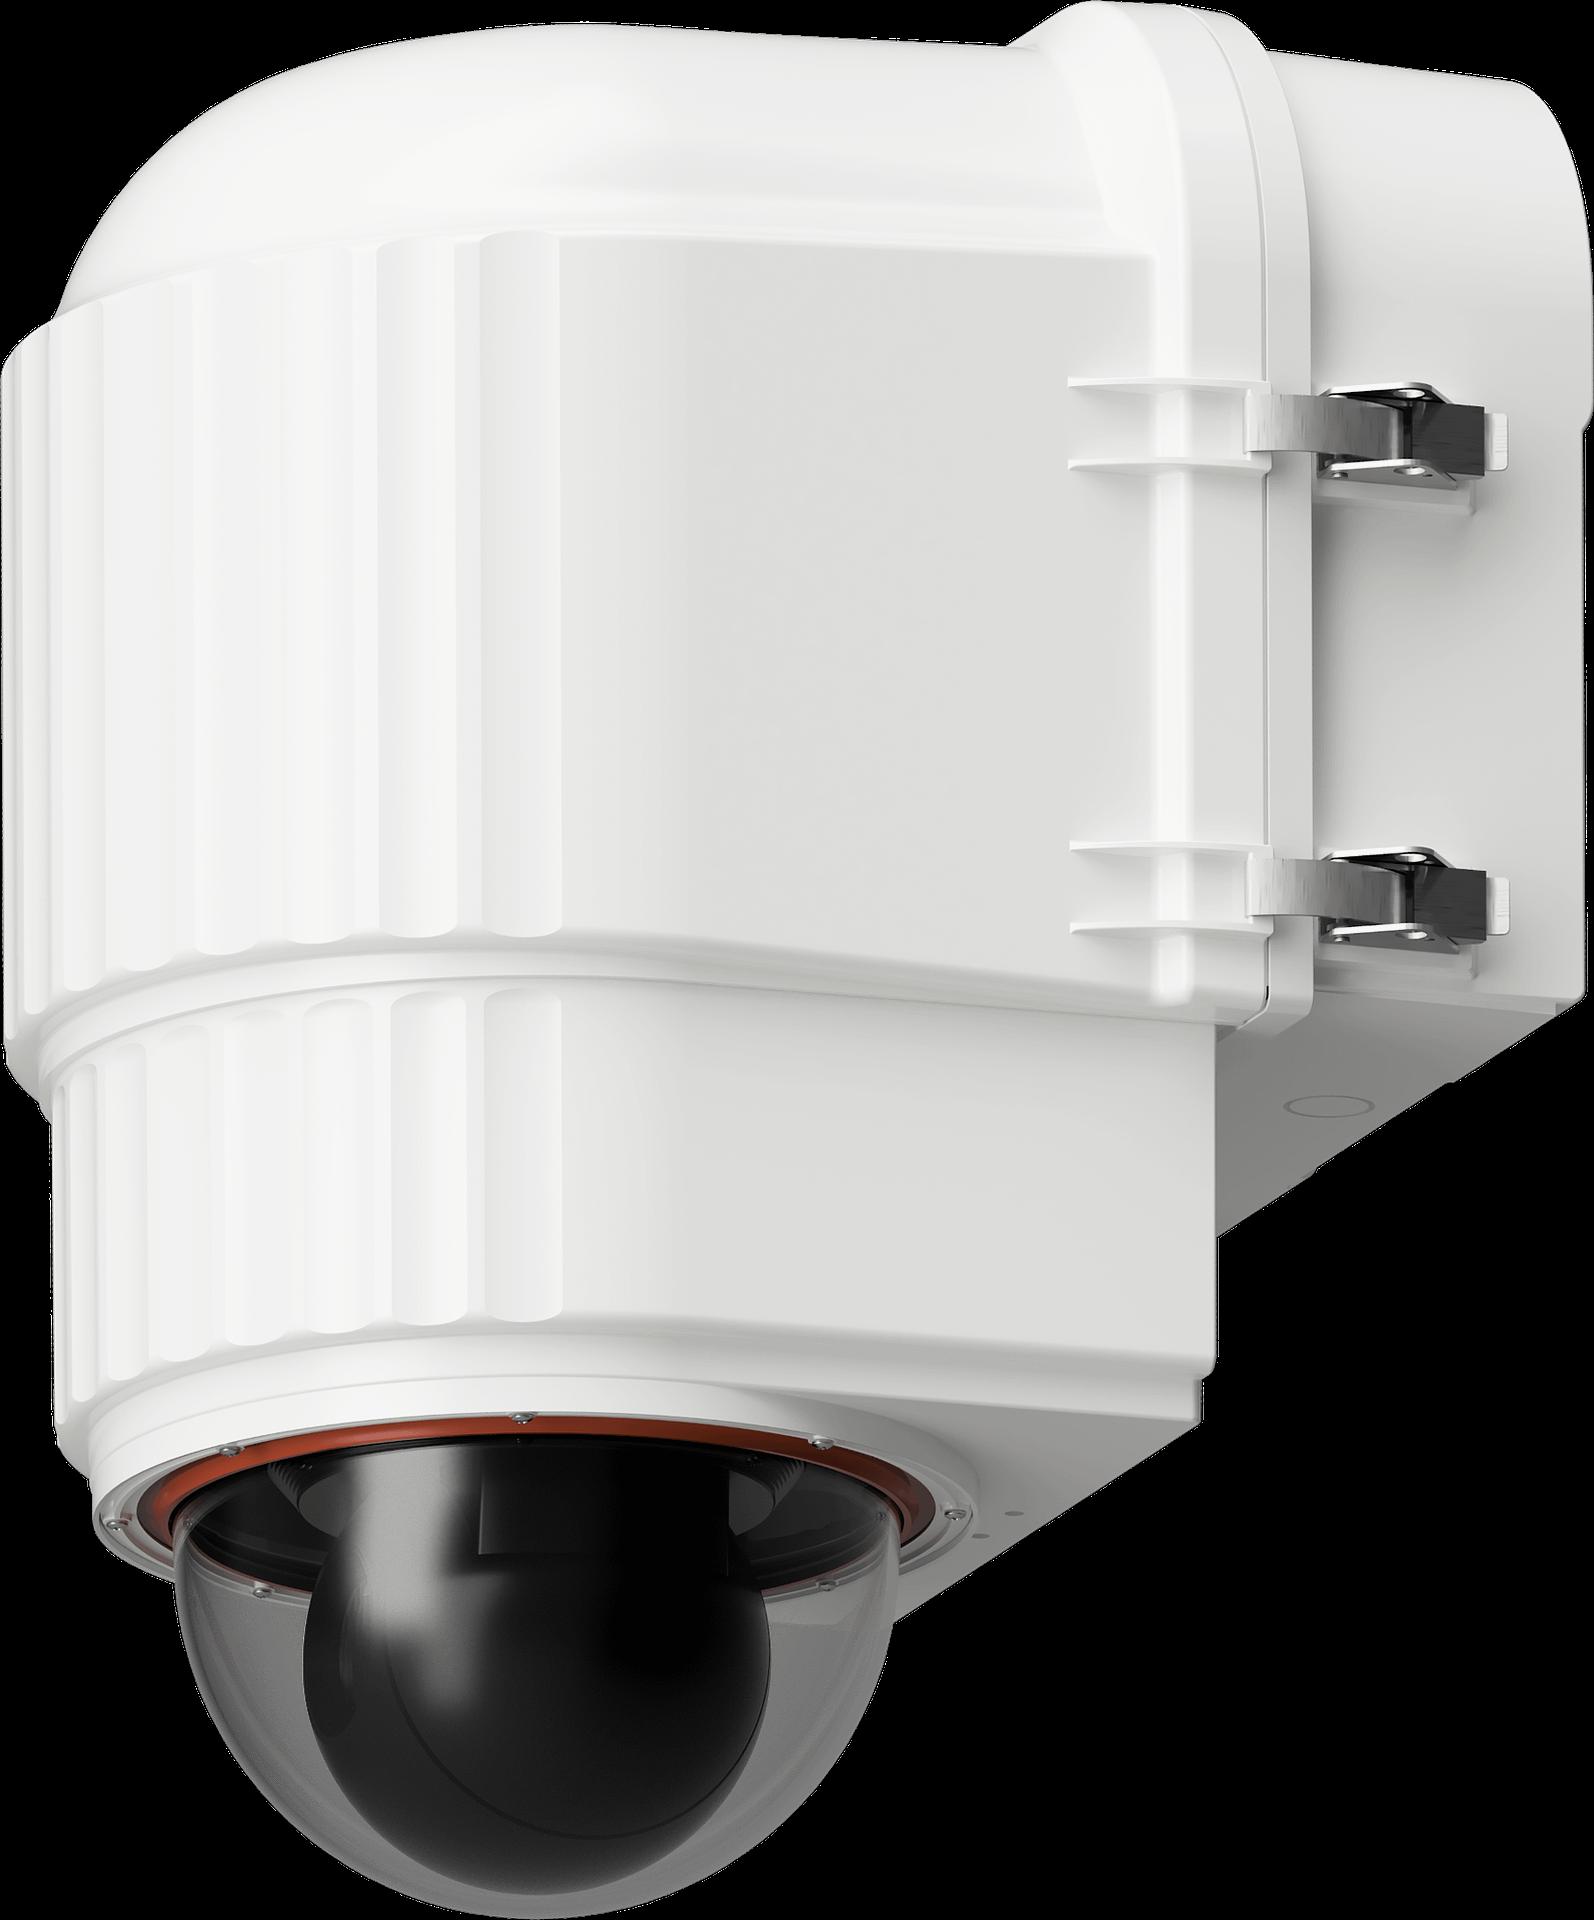 x stream designs xheat ev climate controlled ptz camera enclosure for extreme heat se